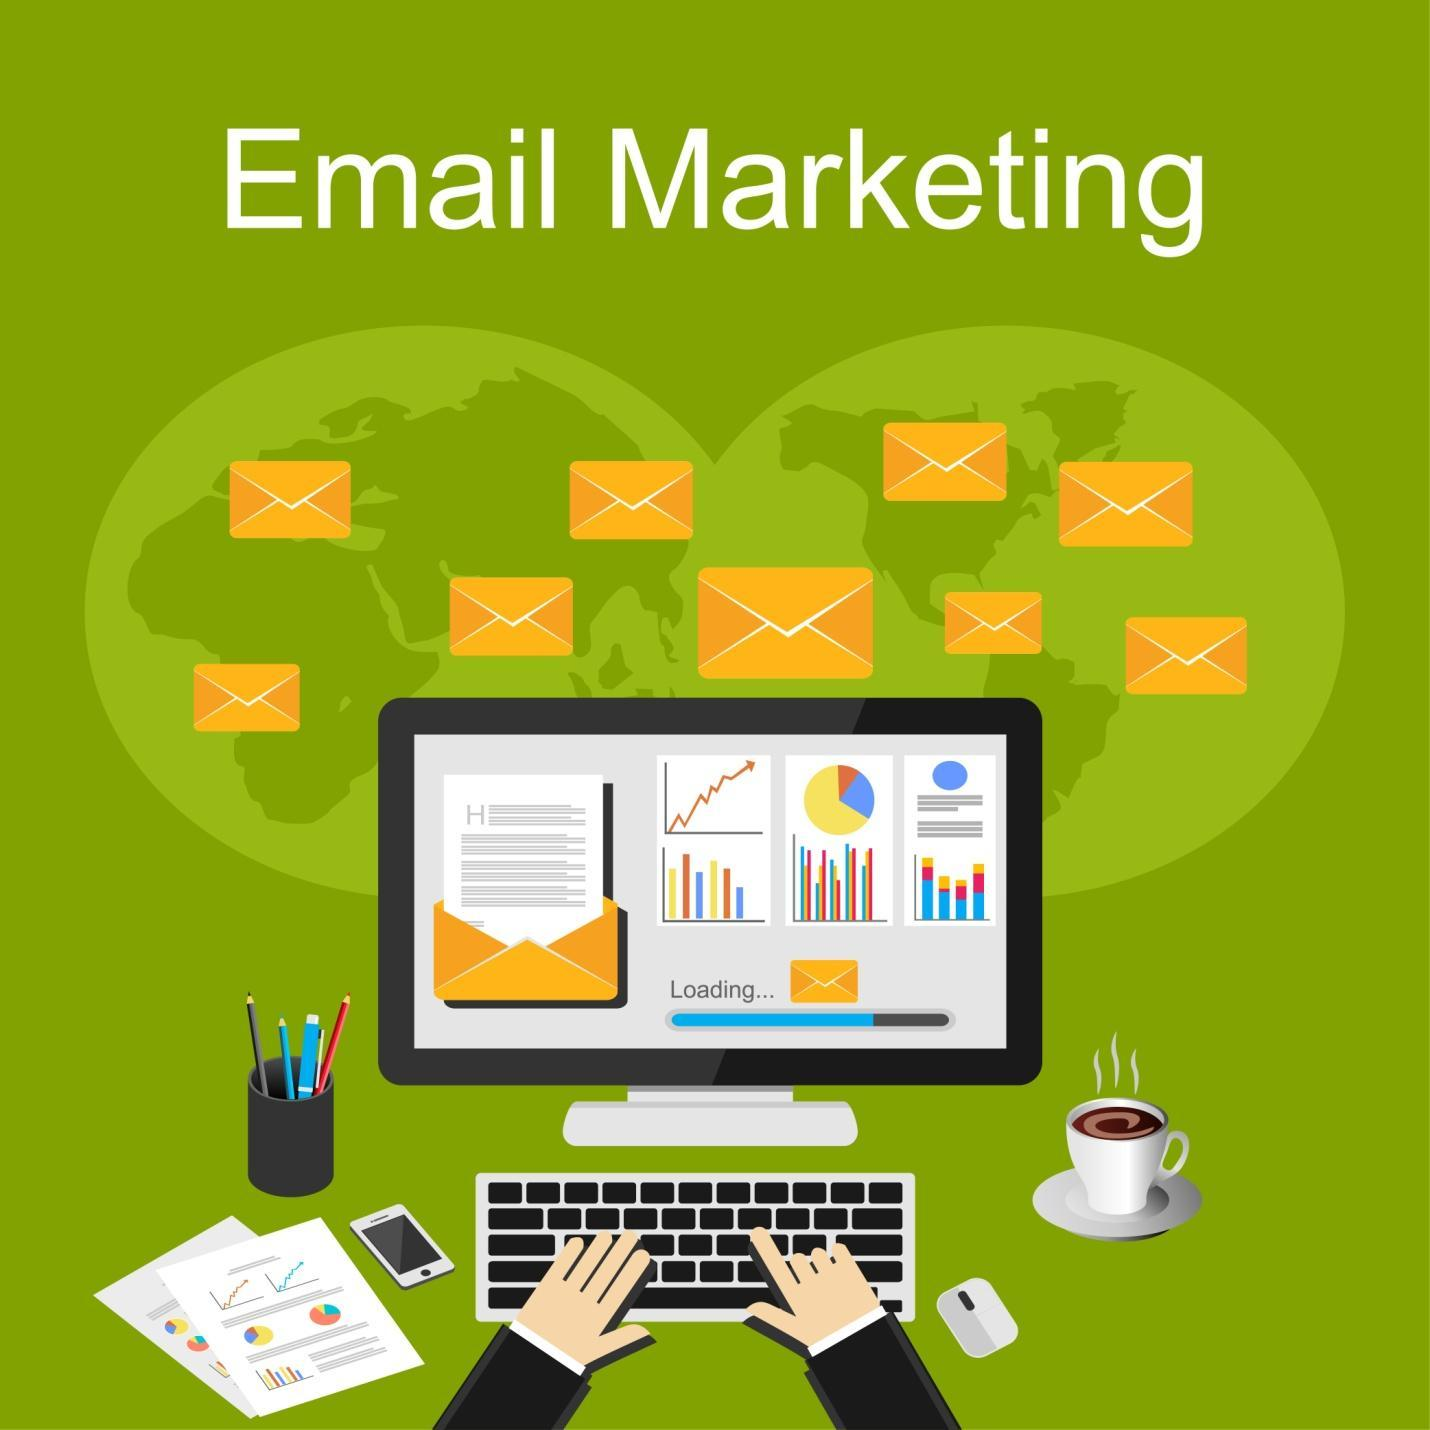 http://corporate.rinhotels.ro/wp-content/uploads/2017/05/campaniile-de-email-marketing.jpg